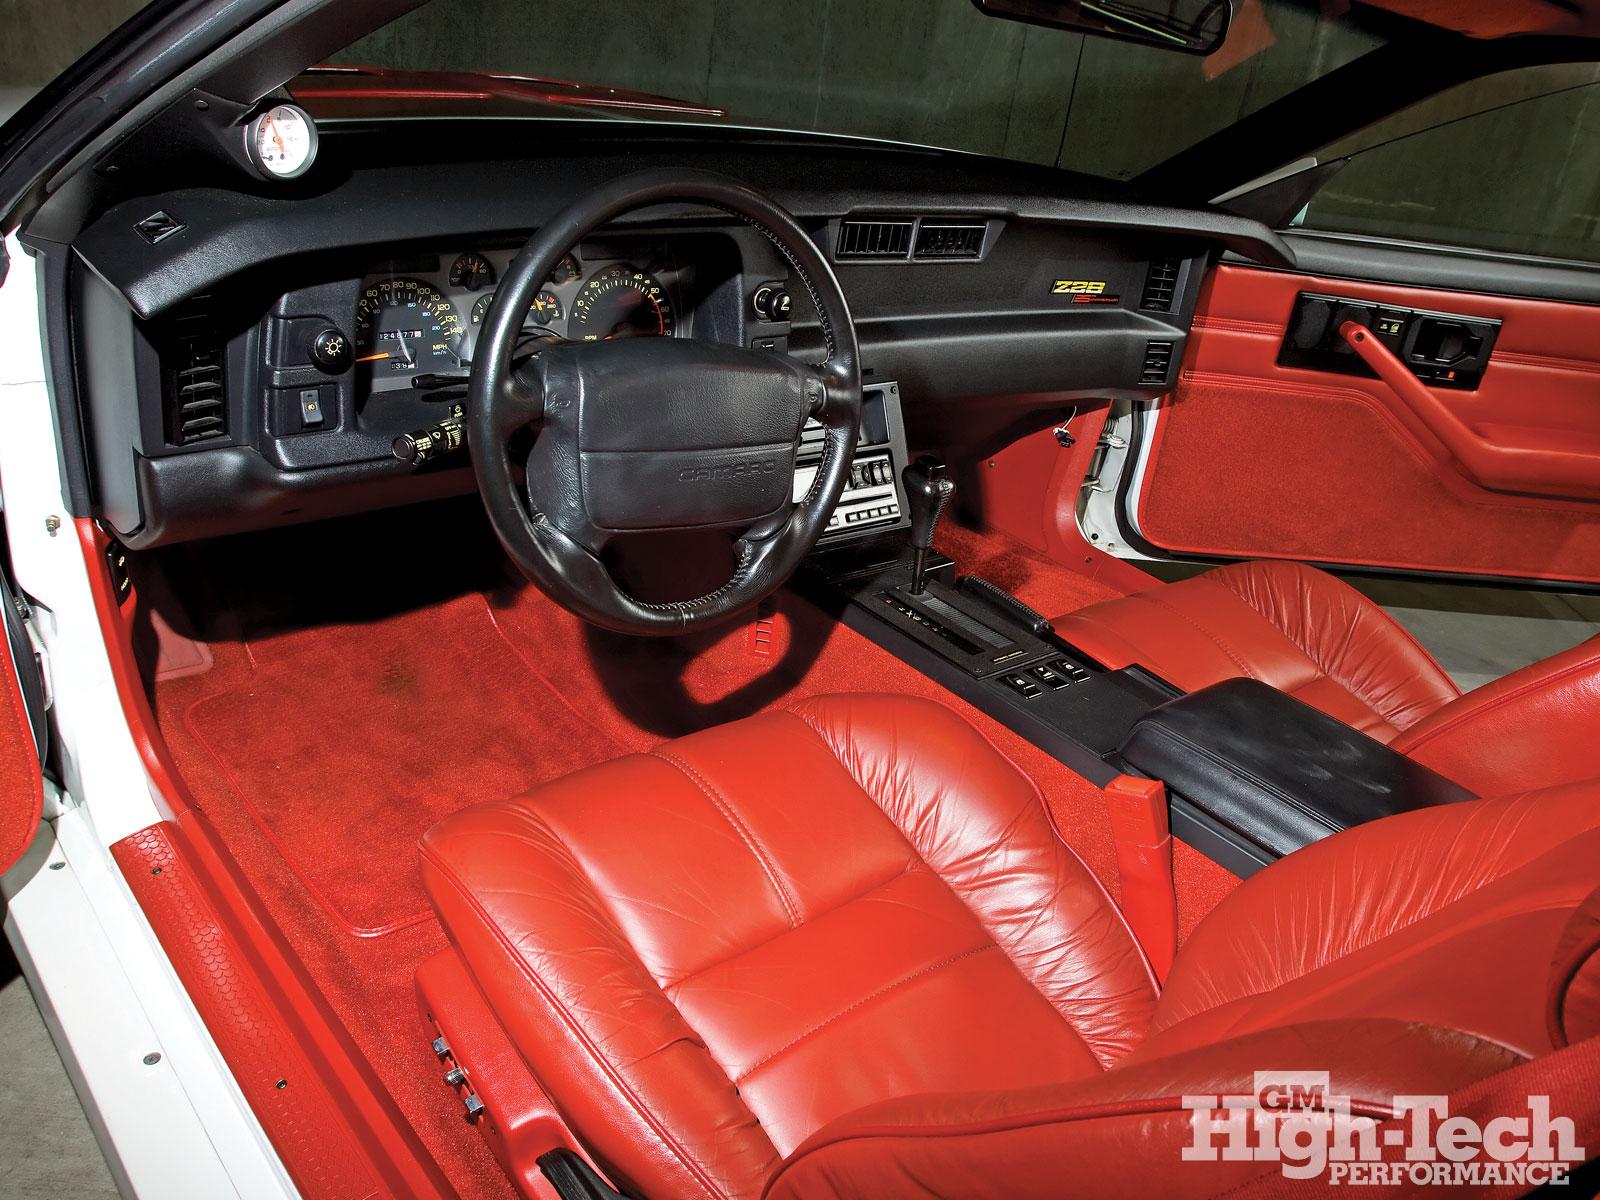 1992 Chevrolet Camaro Rs Coupe Photo 5